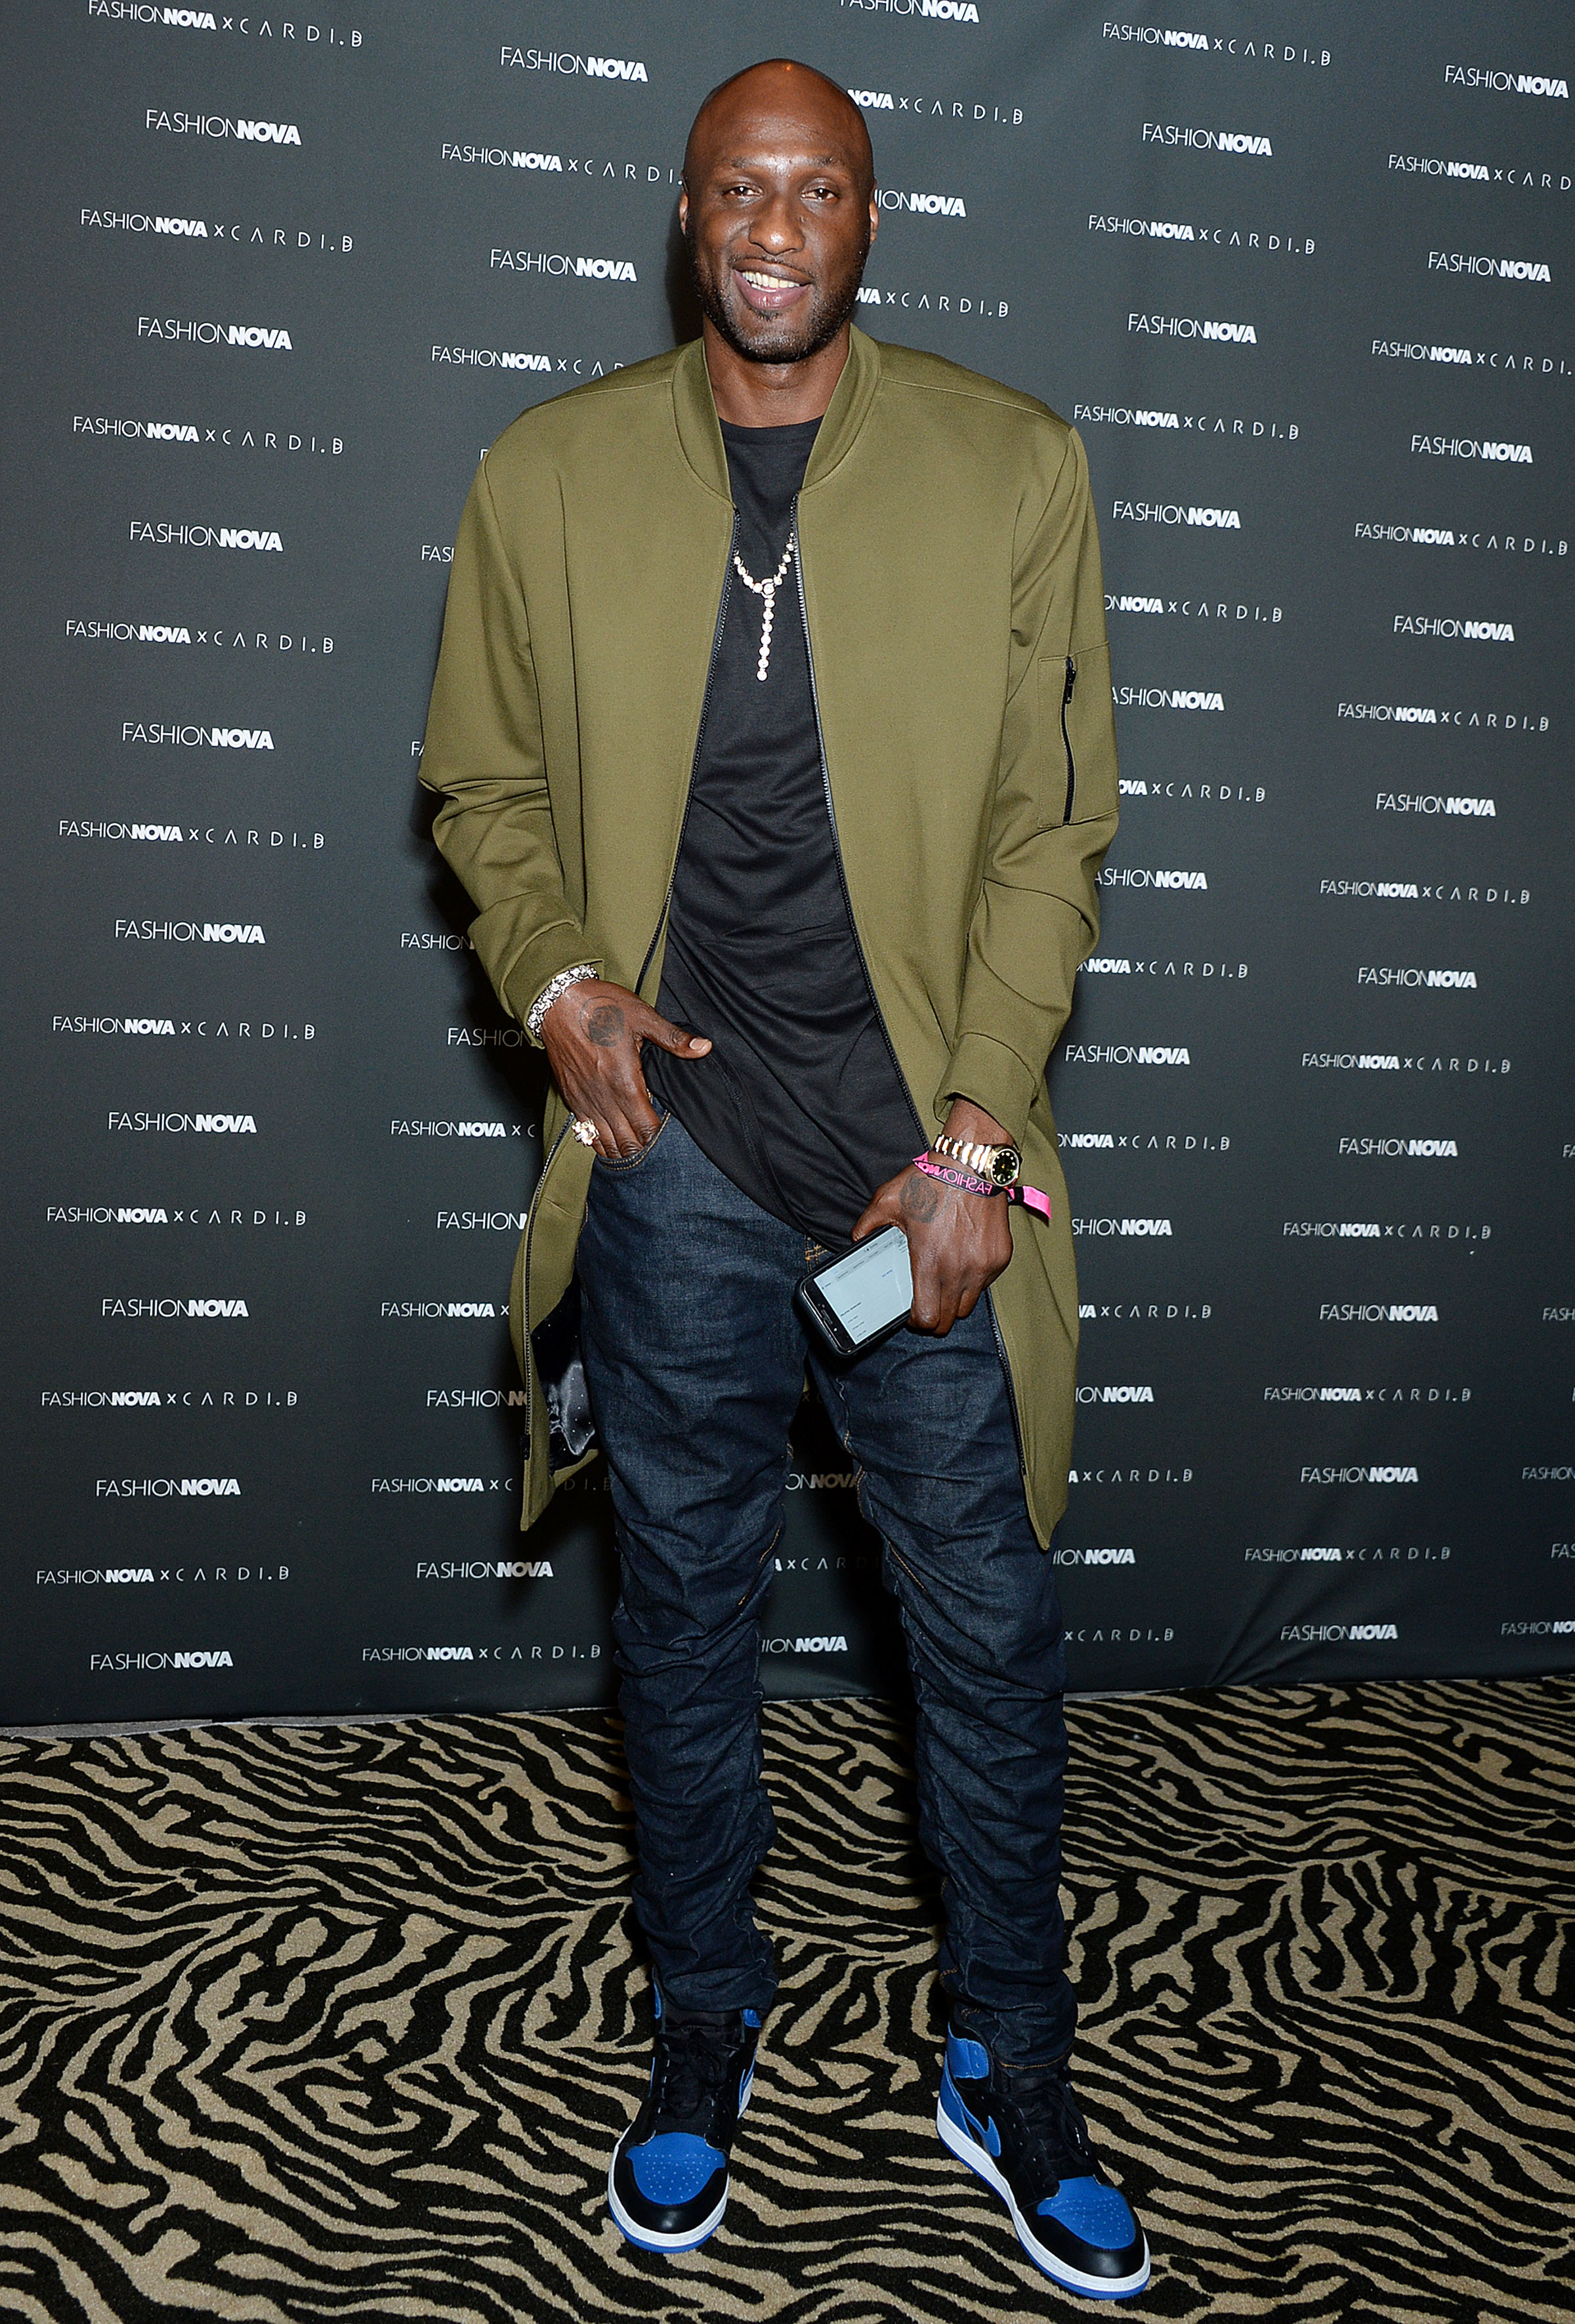 Lamar Odom The Fashion Nova x Cardi B Collection Launch Event